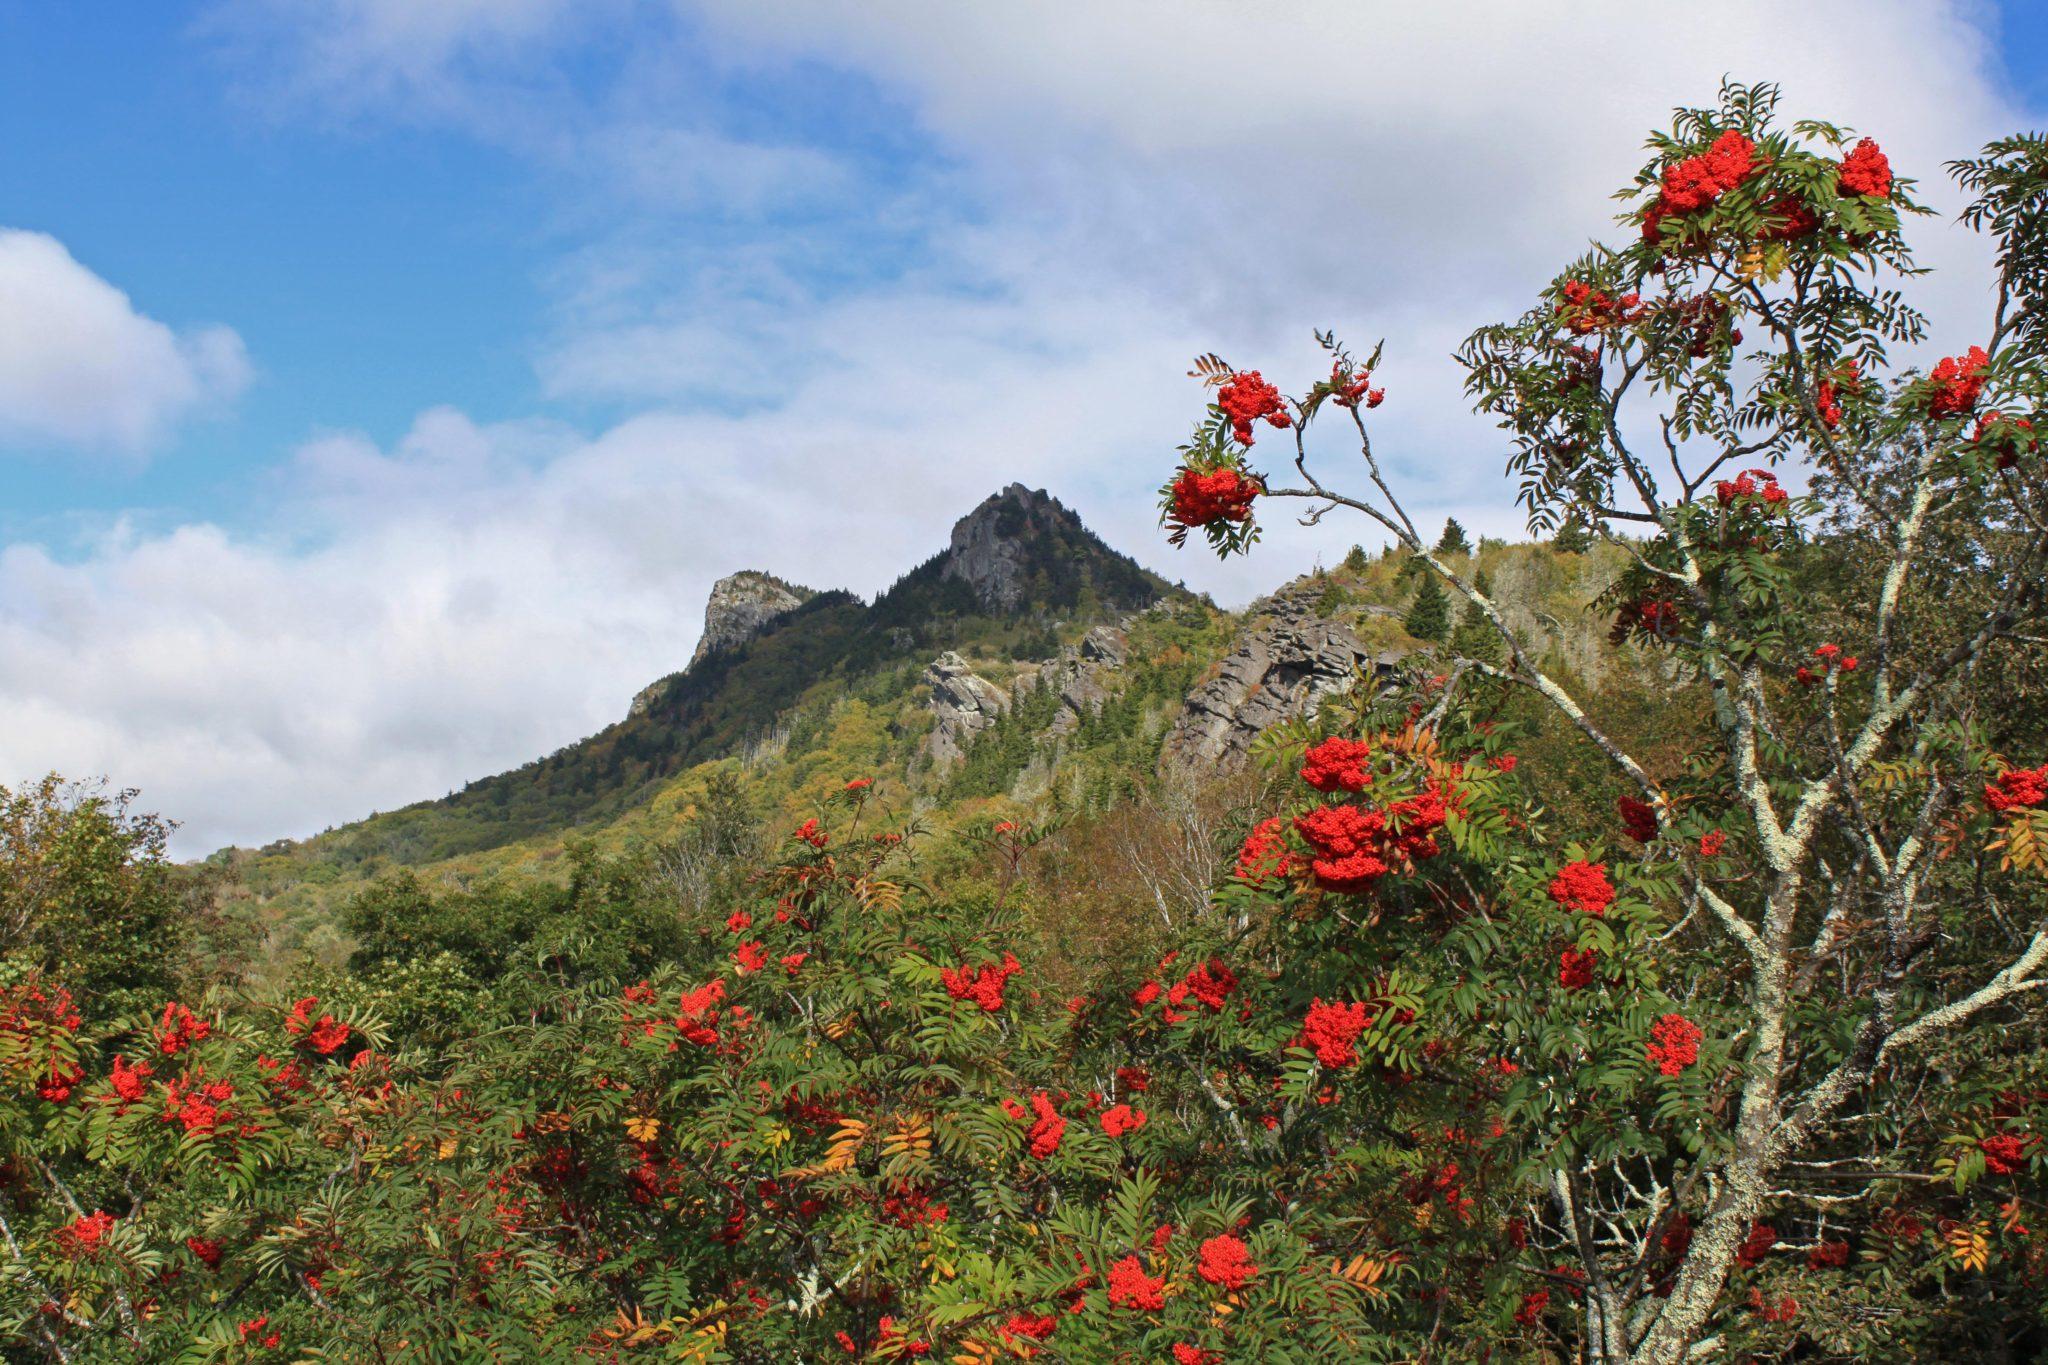 Foliage at grandfather mountain's half moon overlook